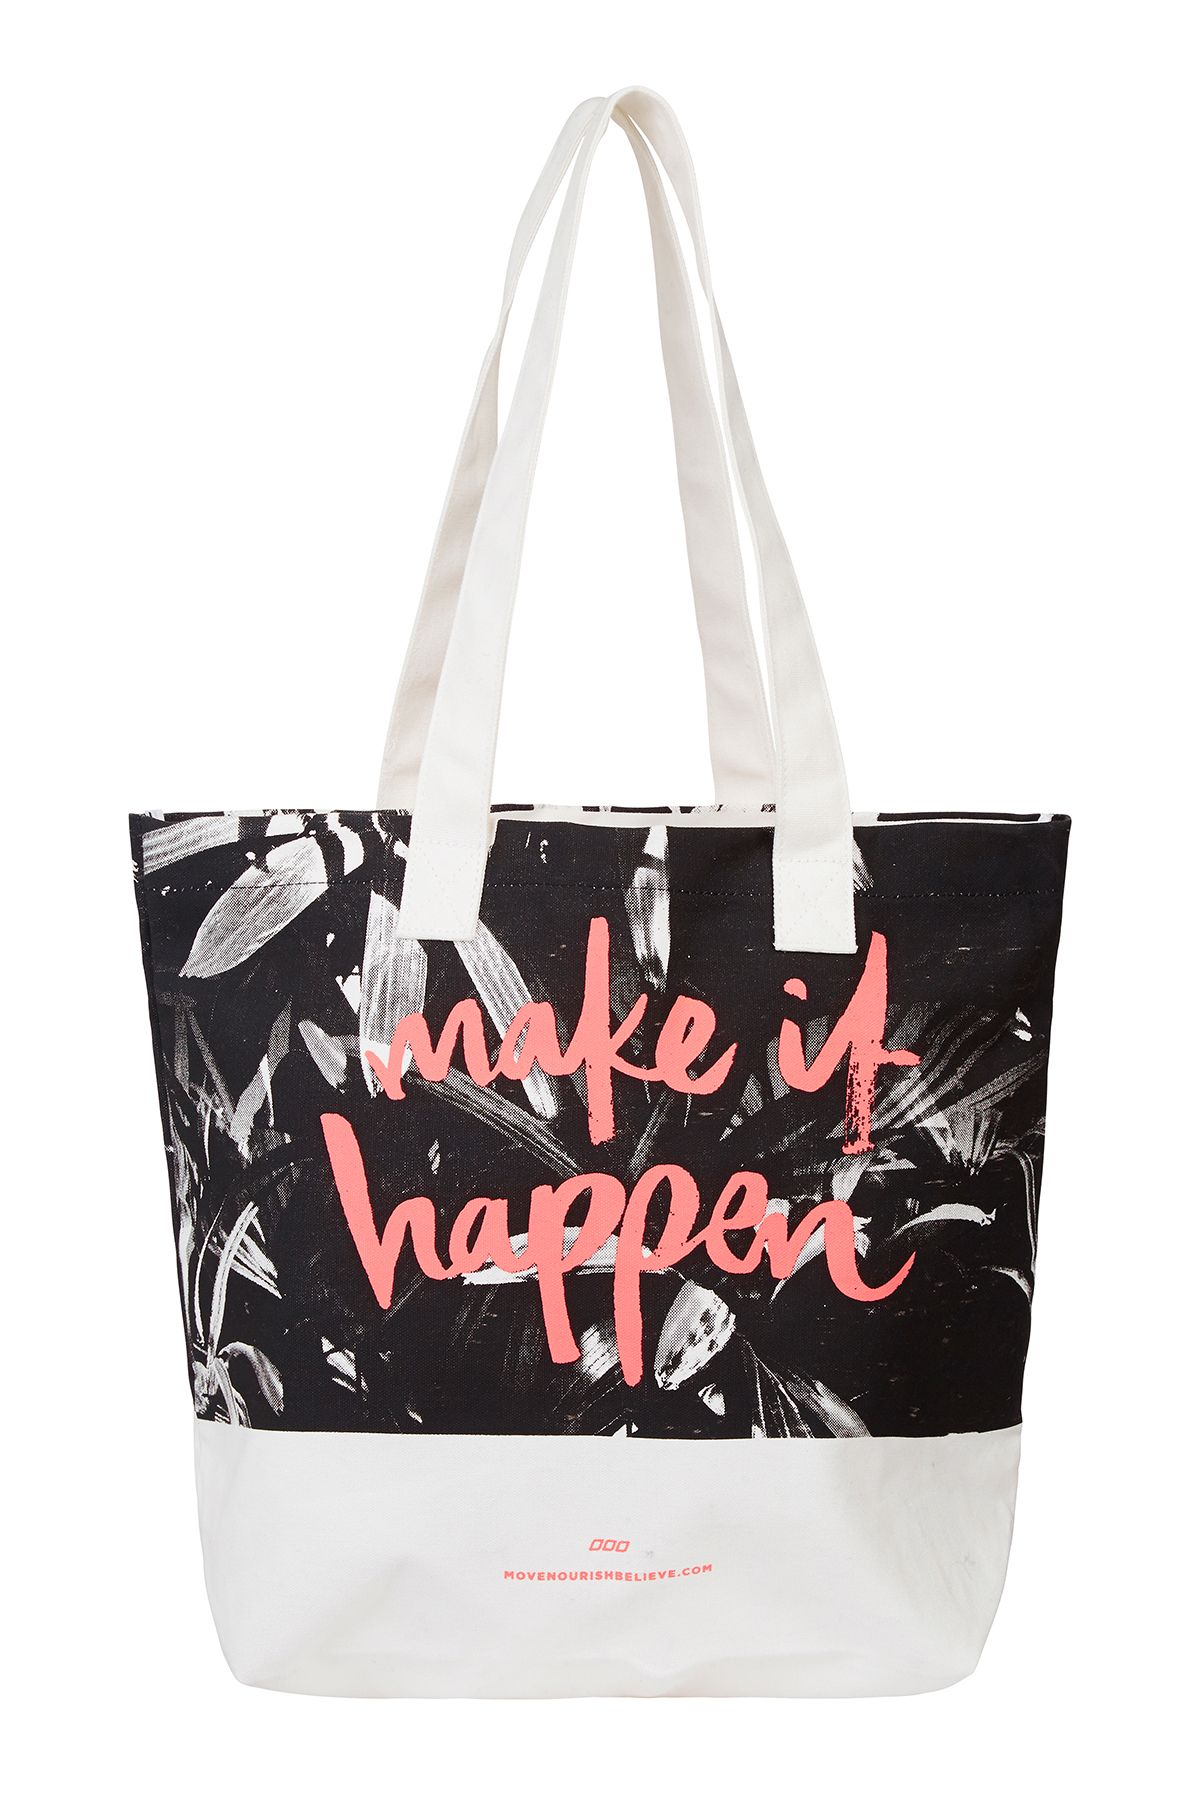 d212c76038 Lorna Jane - Make It Happen Tote Bag (Black   White Print)